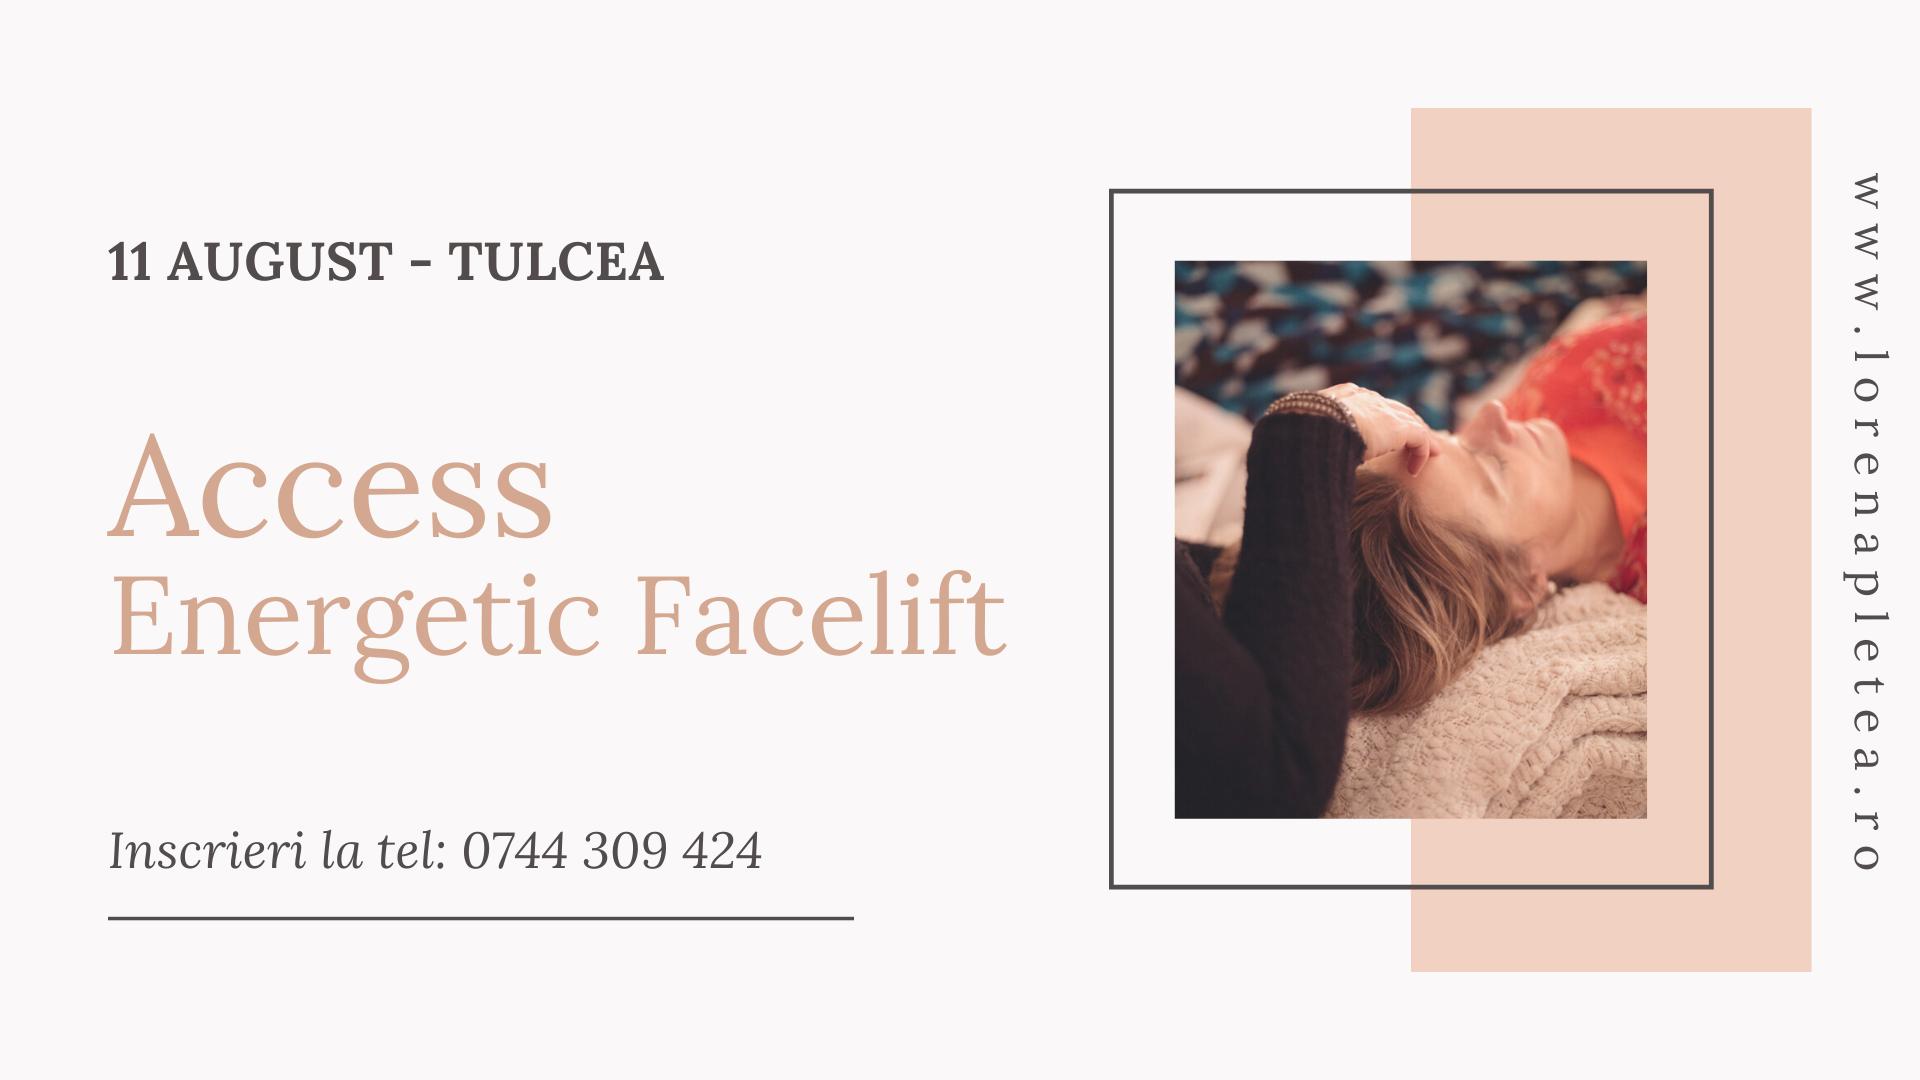 Curs Access Energetic Facelift – 11 August, Tulcea